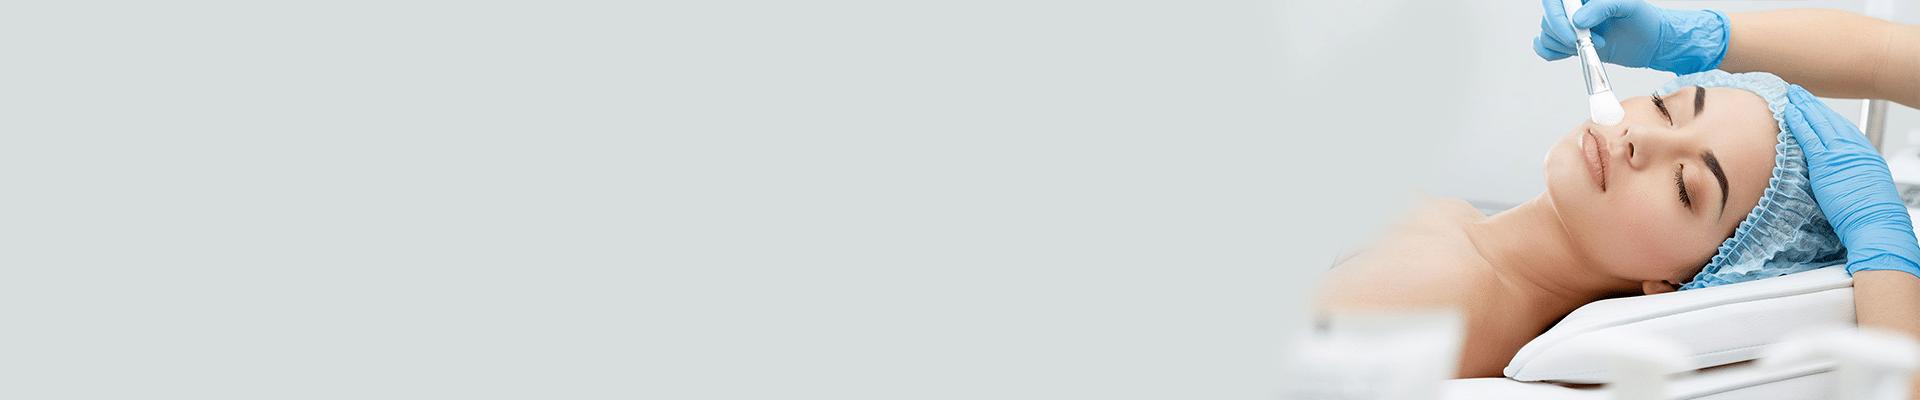 [:fr]Peeling à Nabeul : Peeling  visage TCA, peeling glycolique peau lisse et rajeunit[:ar]التقشير في نابل: تقشيرTCA  للوجه ، تقشير جليكوليك لبشرة ناعمة وتجديد شبابها [:]